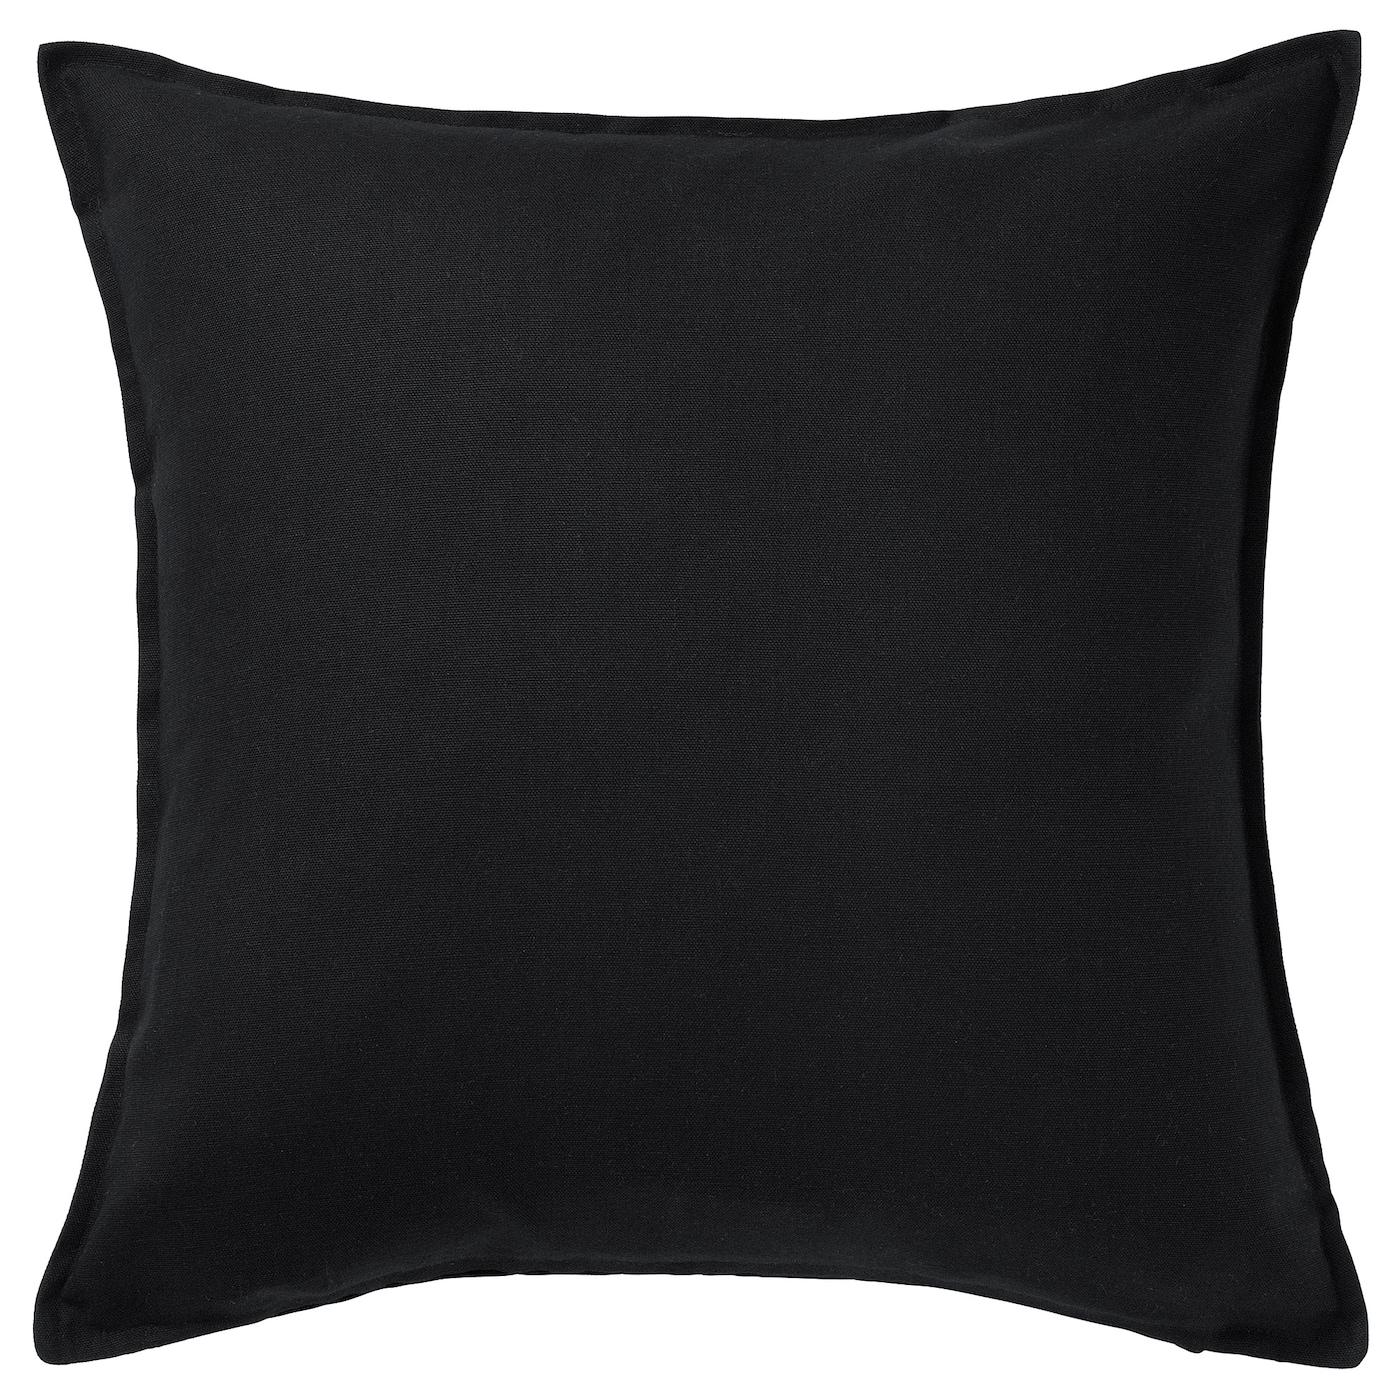 turill coussin blanc noir 40 x 40 cm ikea. Black Bedroom Furniture Sets. Home Design Ideas